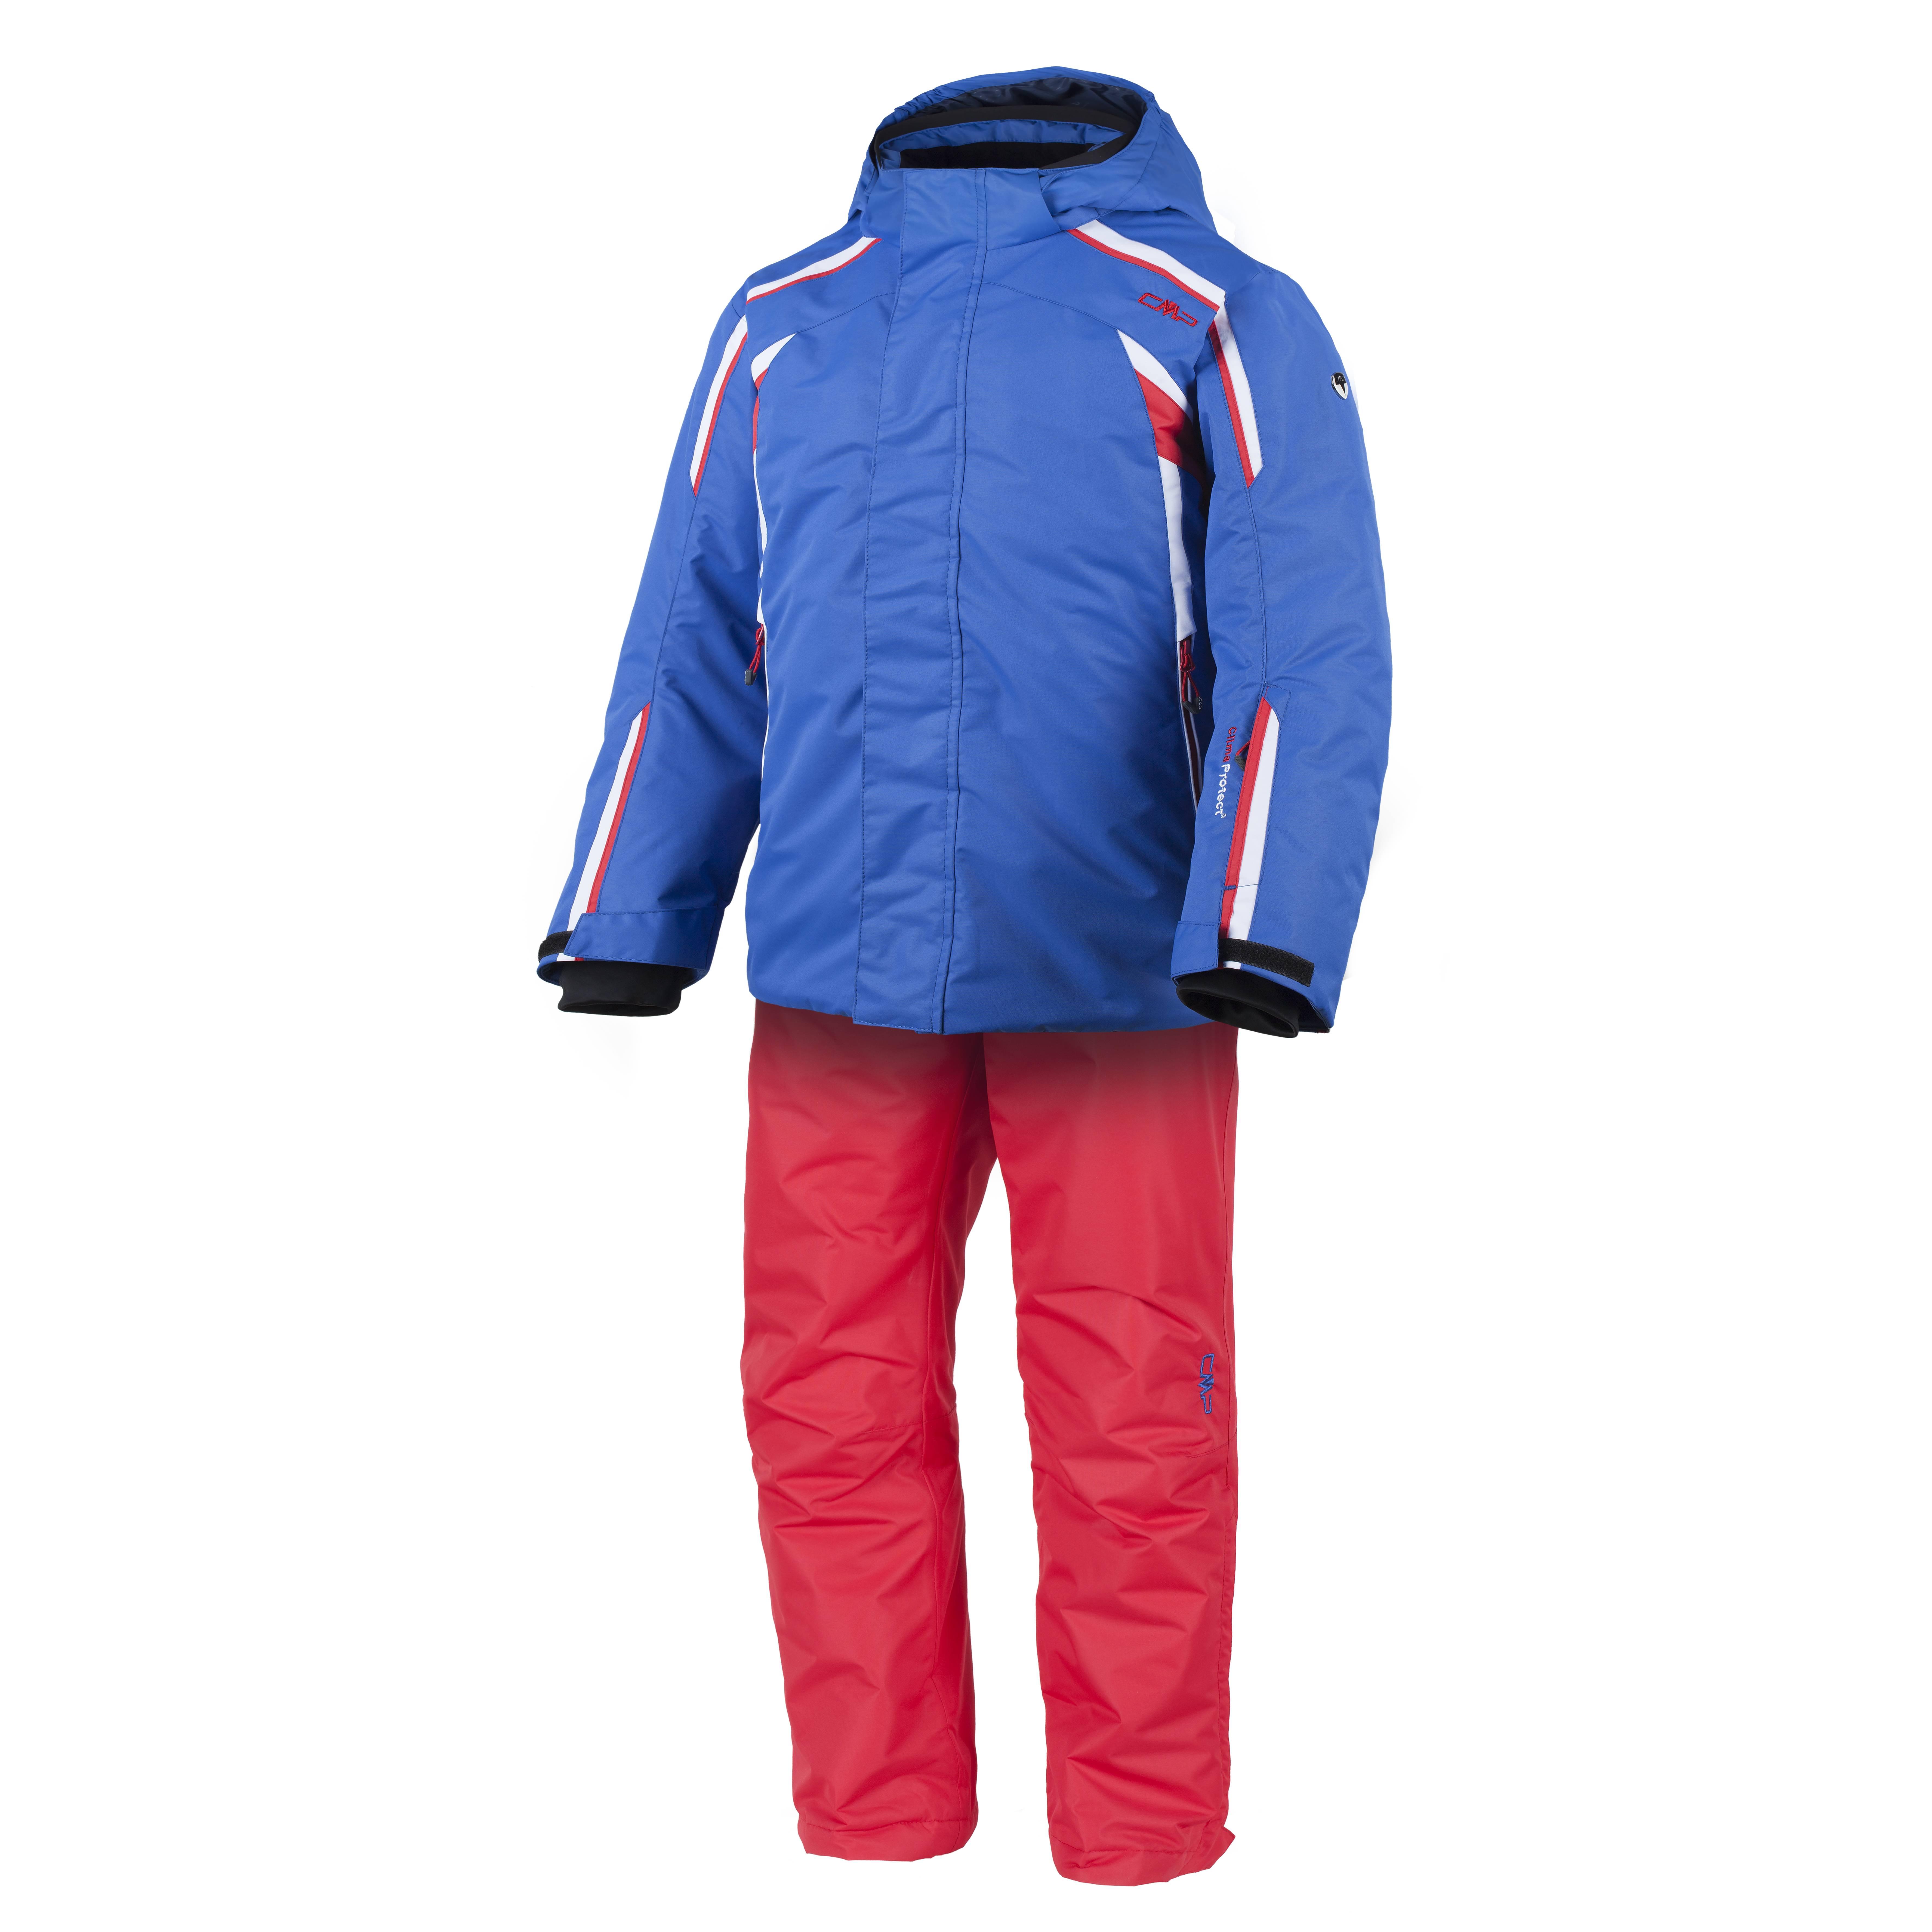 CMP-Set-Esqui-Chaqueta-Pantalones-blau-impermeable-ClimaProtect-abrigados